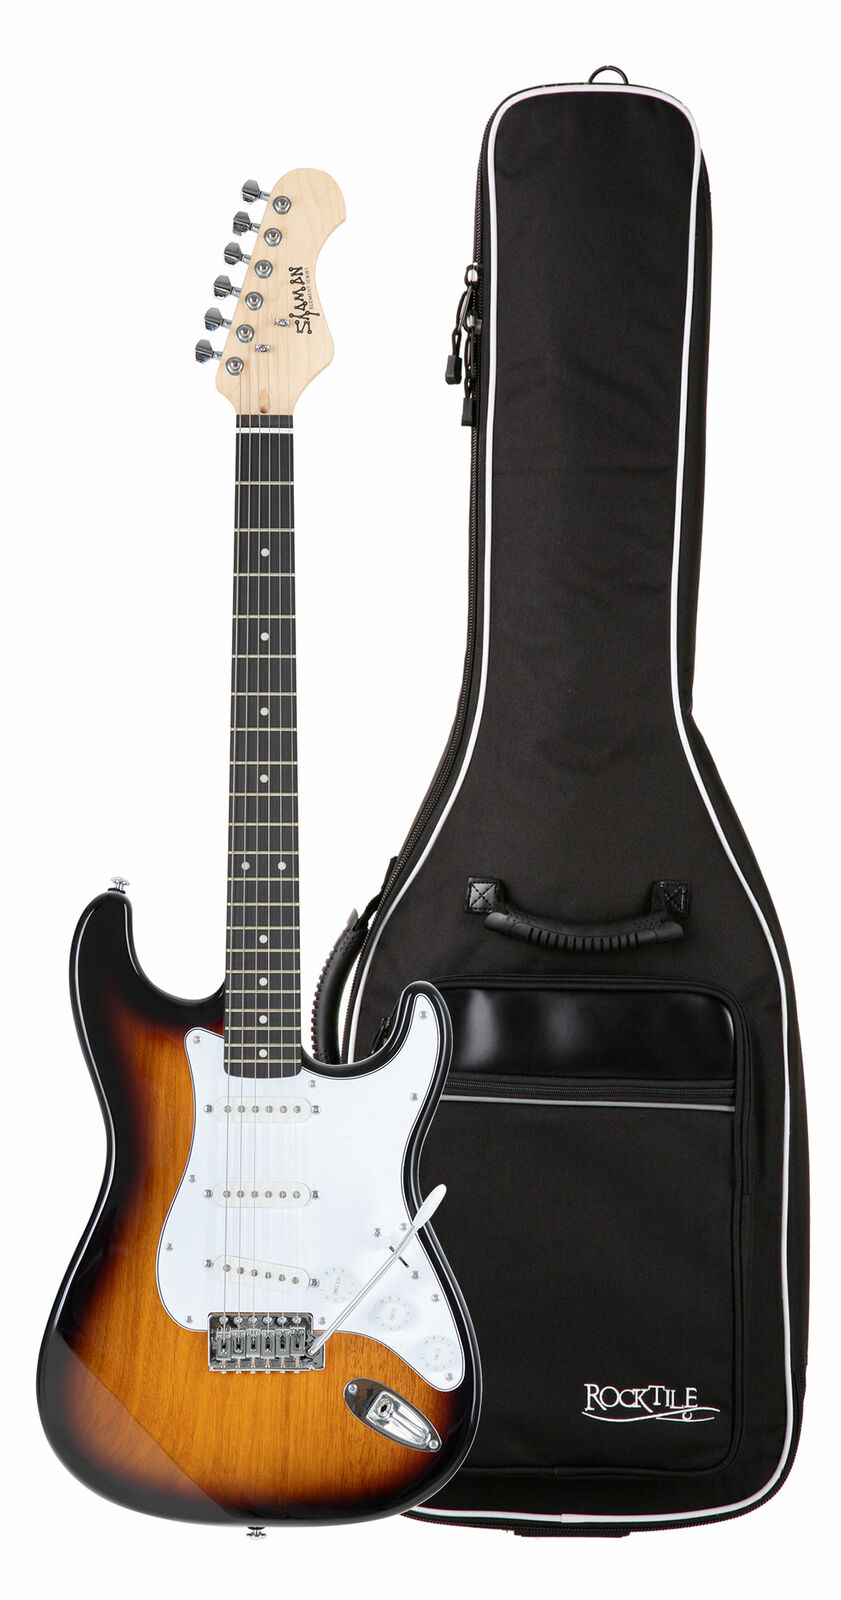 Traumhaftes Shaman E-Gitarren Set ST Style mit 3 Single Coil mit Gigbag Sunburst